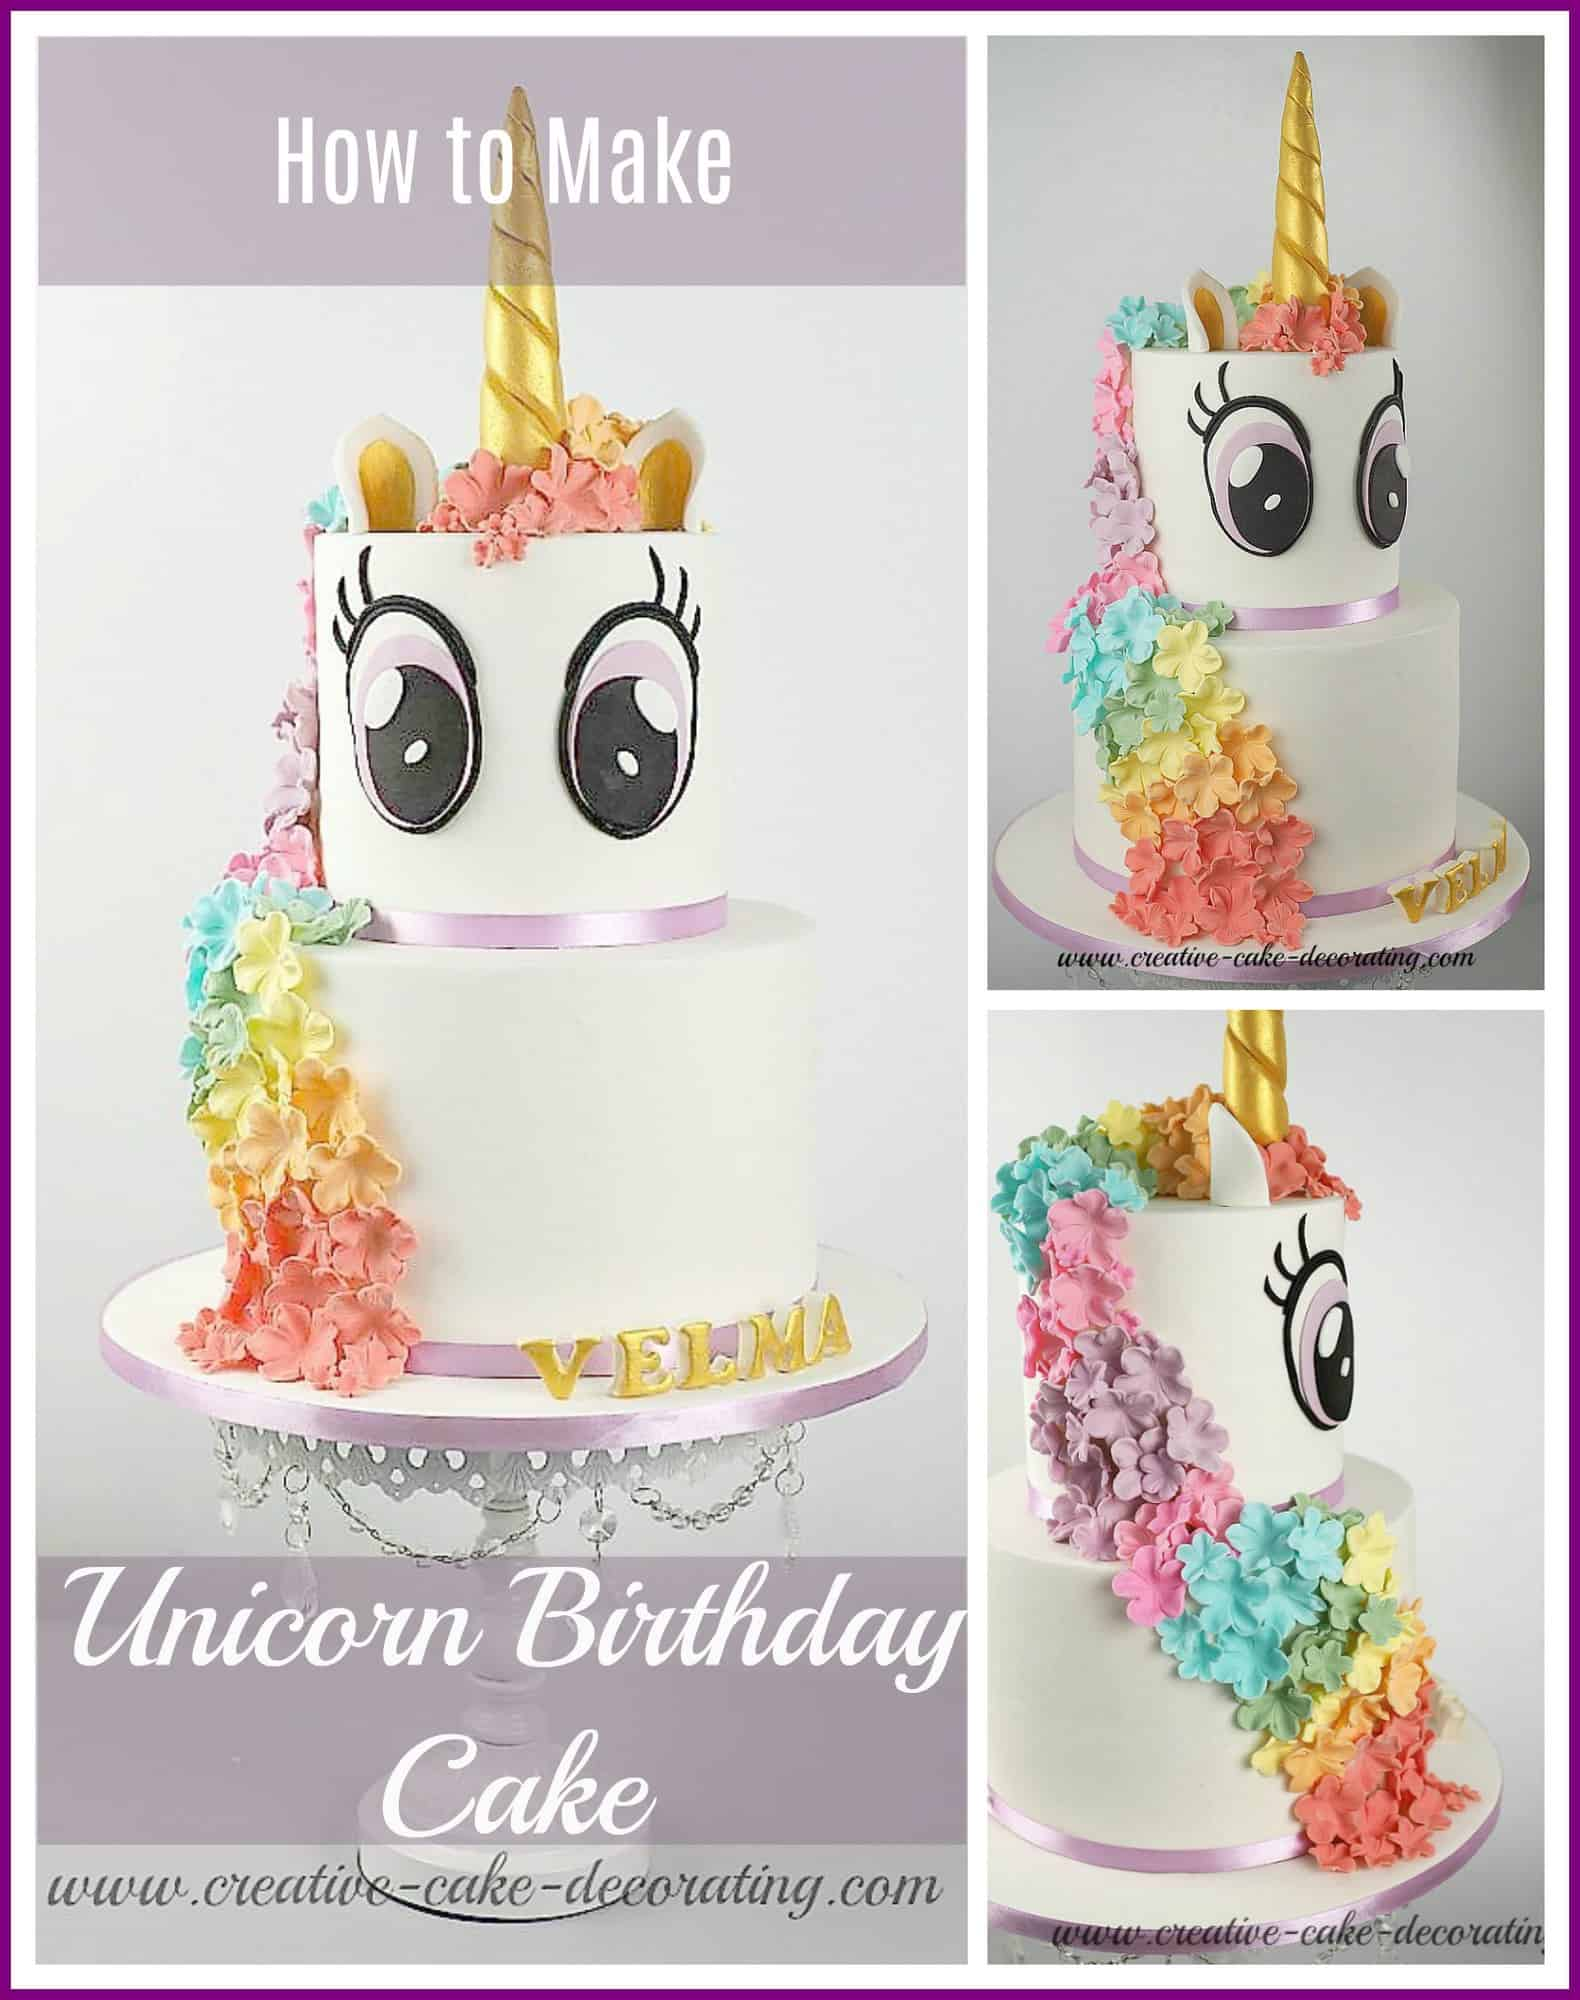 Poster for unicorn birthday cake